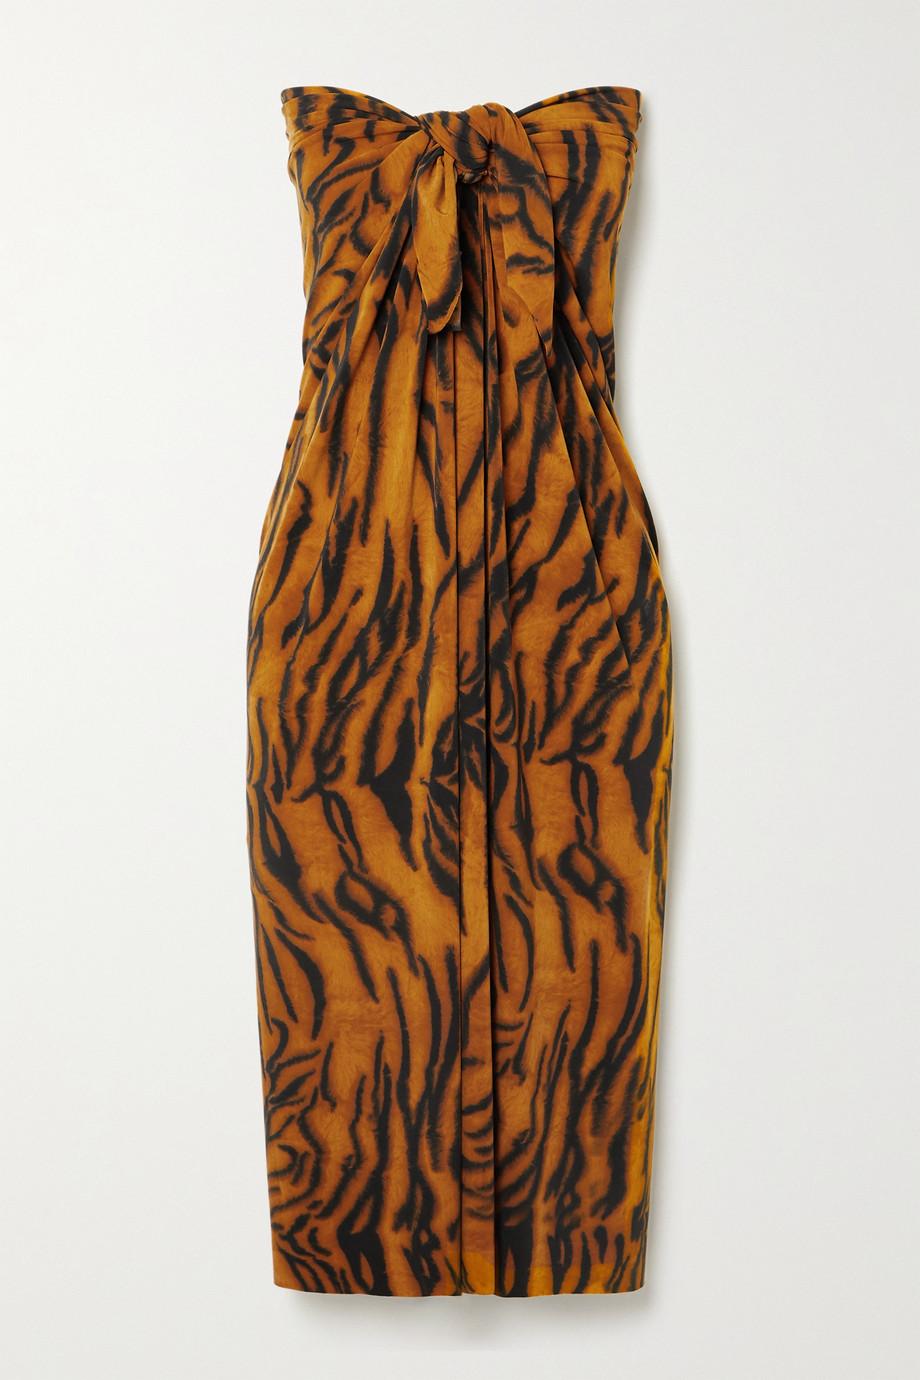 Norma Kamali Ernie tiger-print jersey pareo